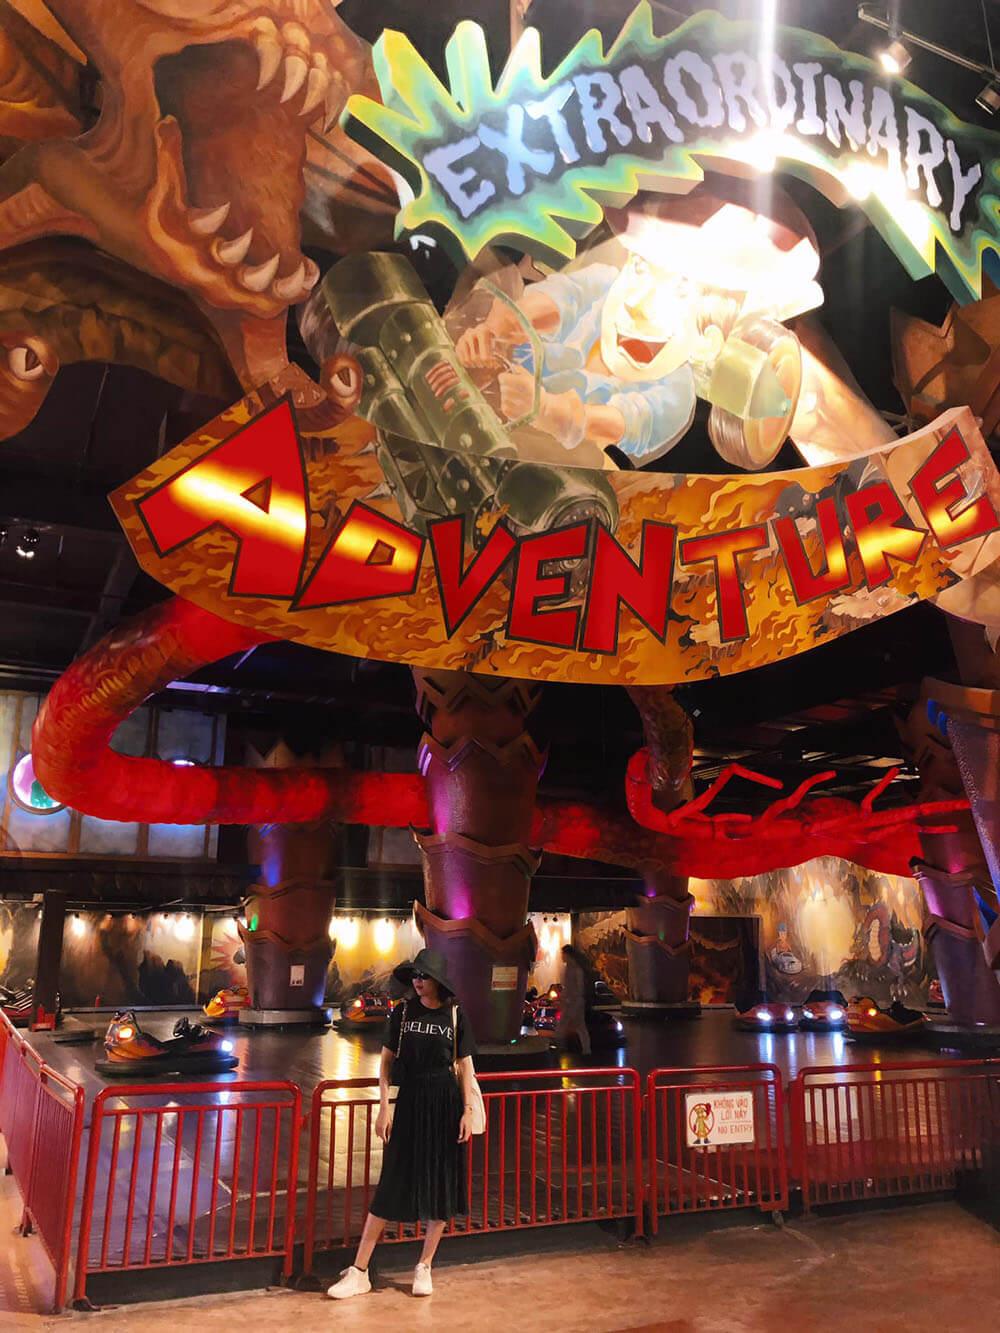 Cong Vien Fantasy Park Review Hue Da Nang Hoi An Ninh Binh 7n7d Chi Voi 8 Trieu Tin Duoc Khong